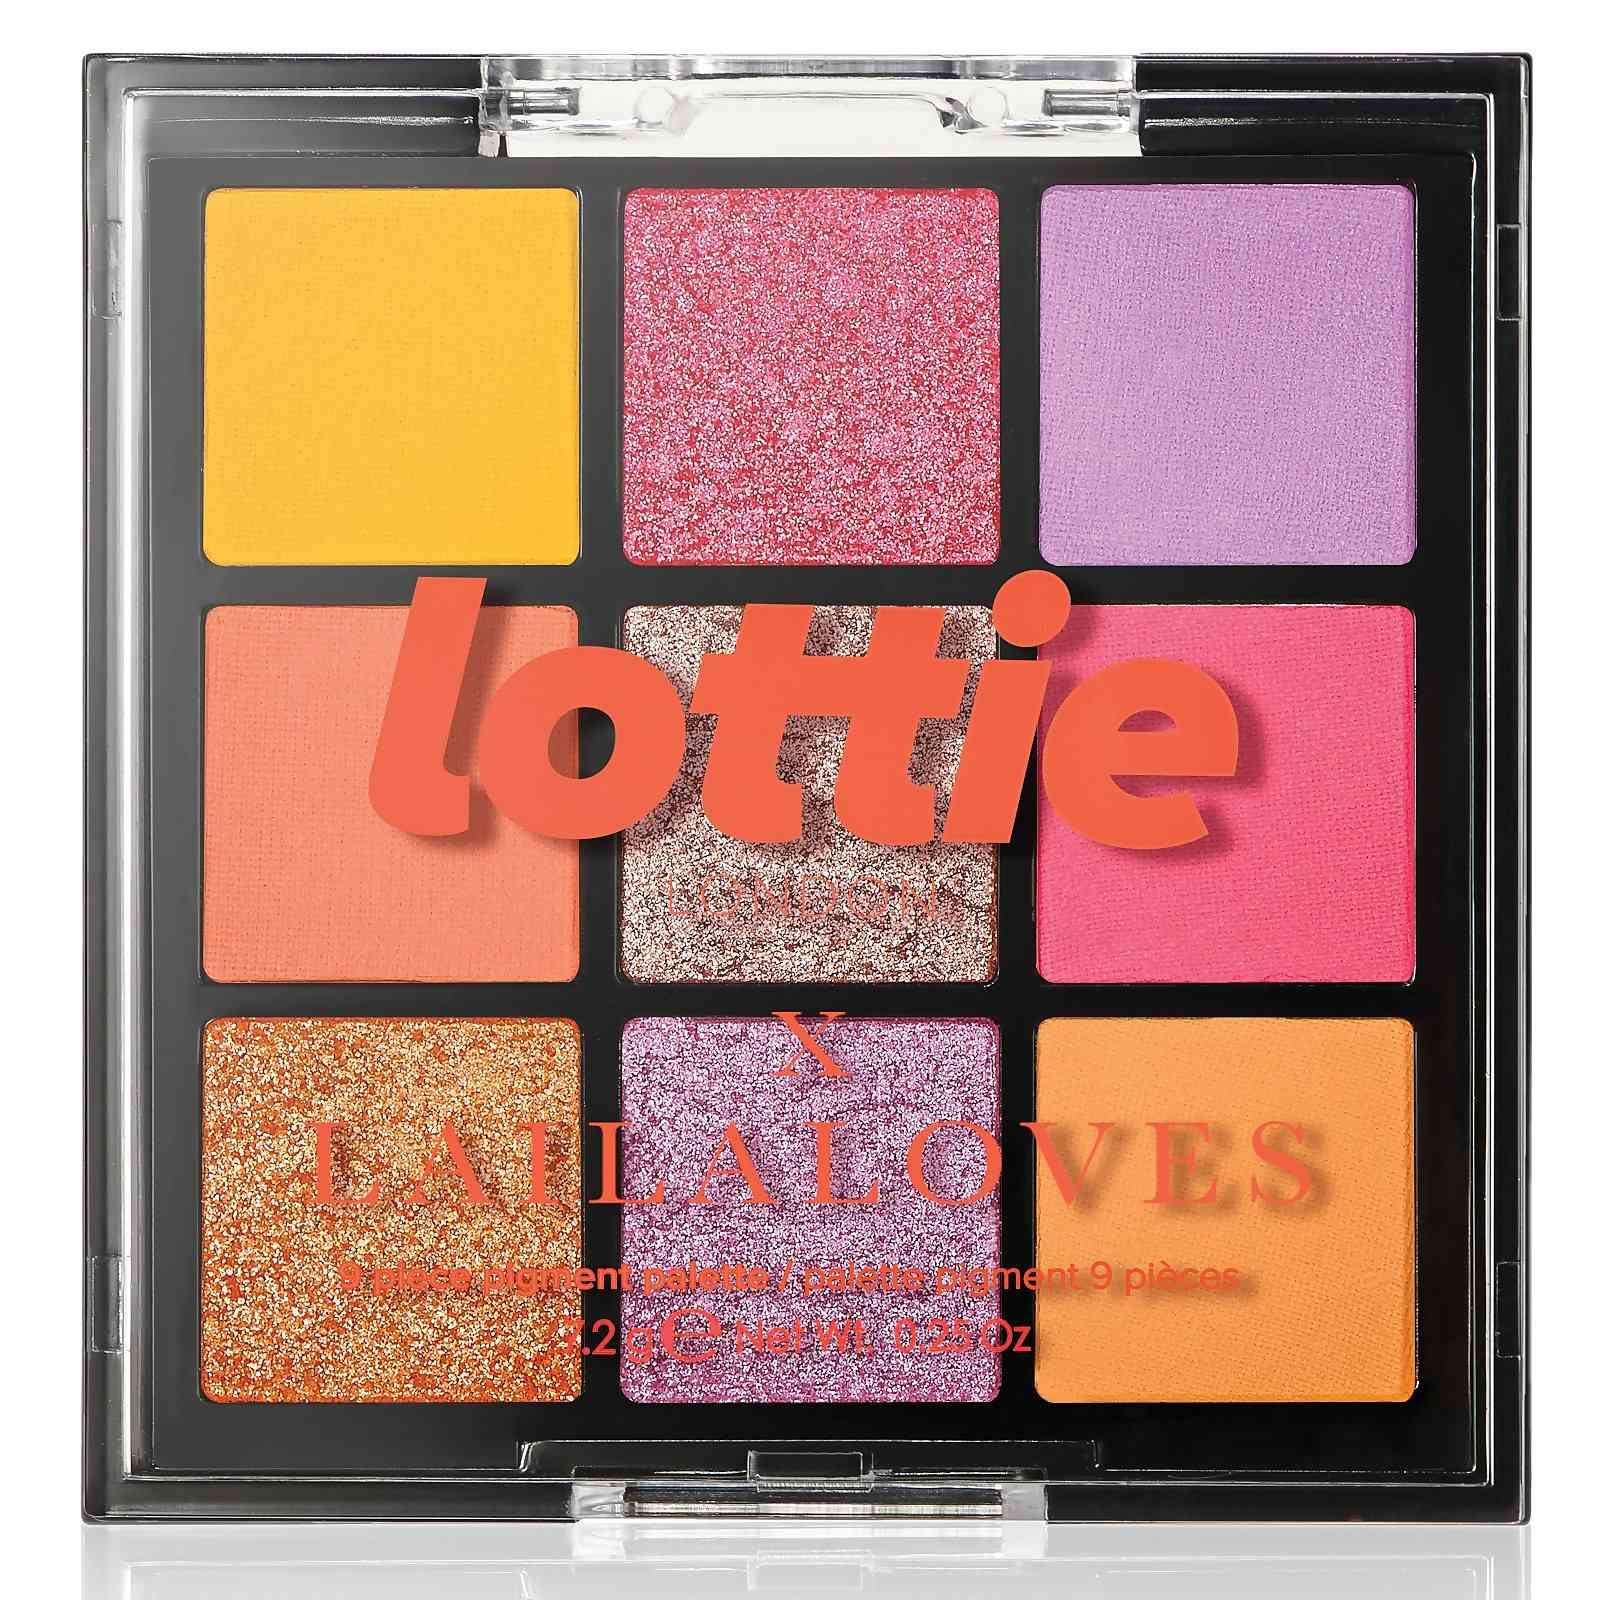 Lottie London Ibiza Palette - New Year's Eve Makeup